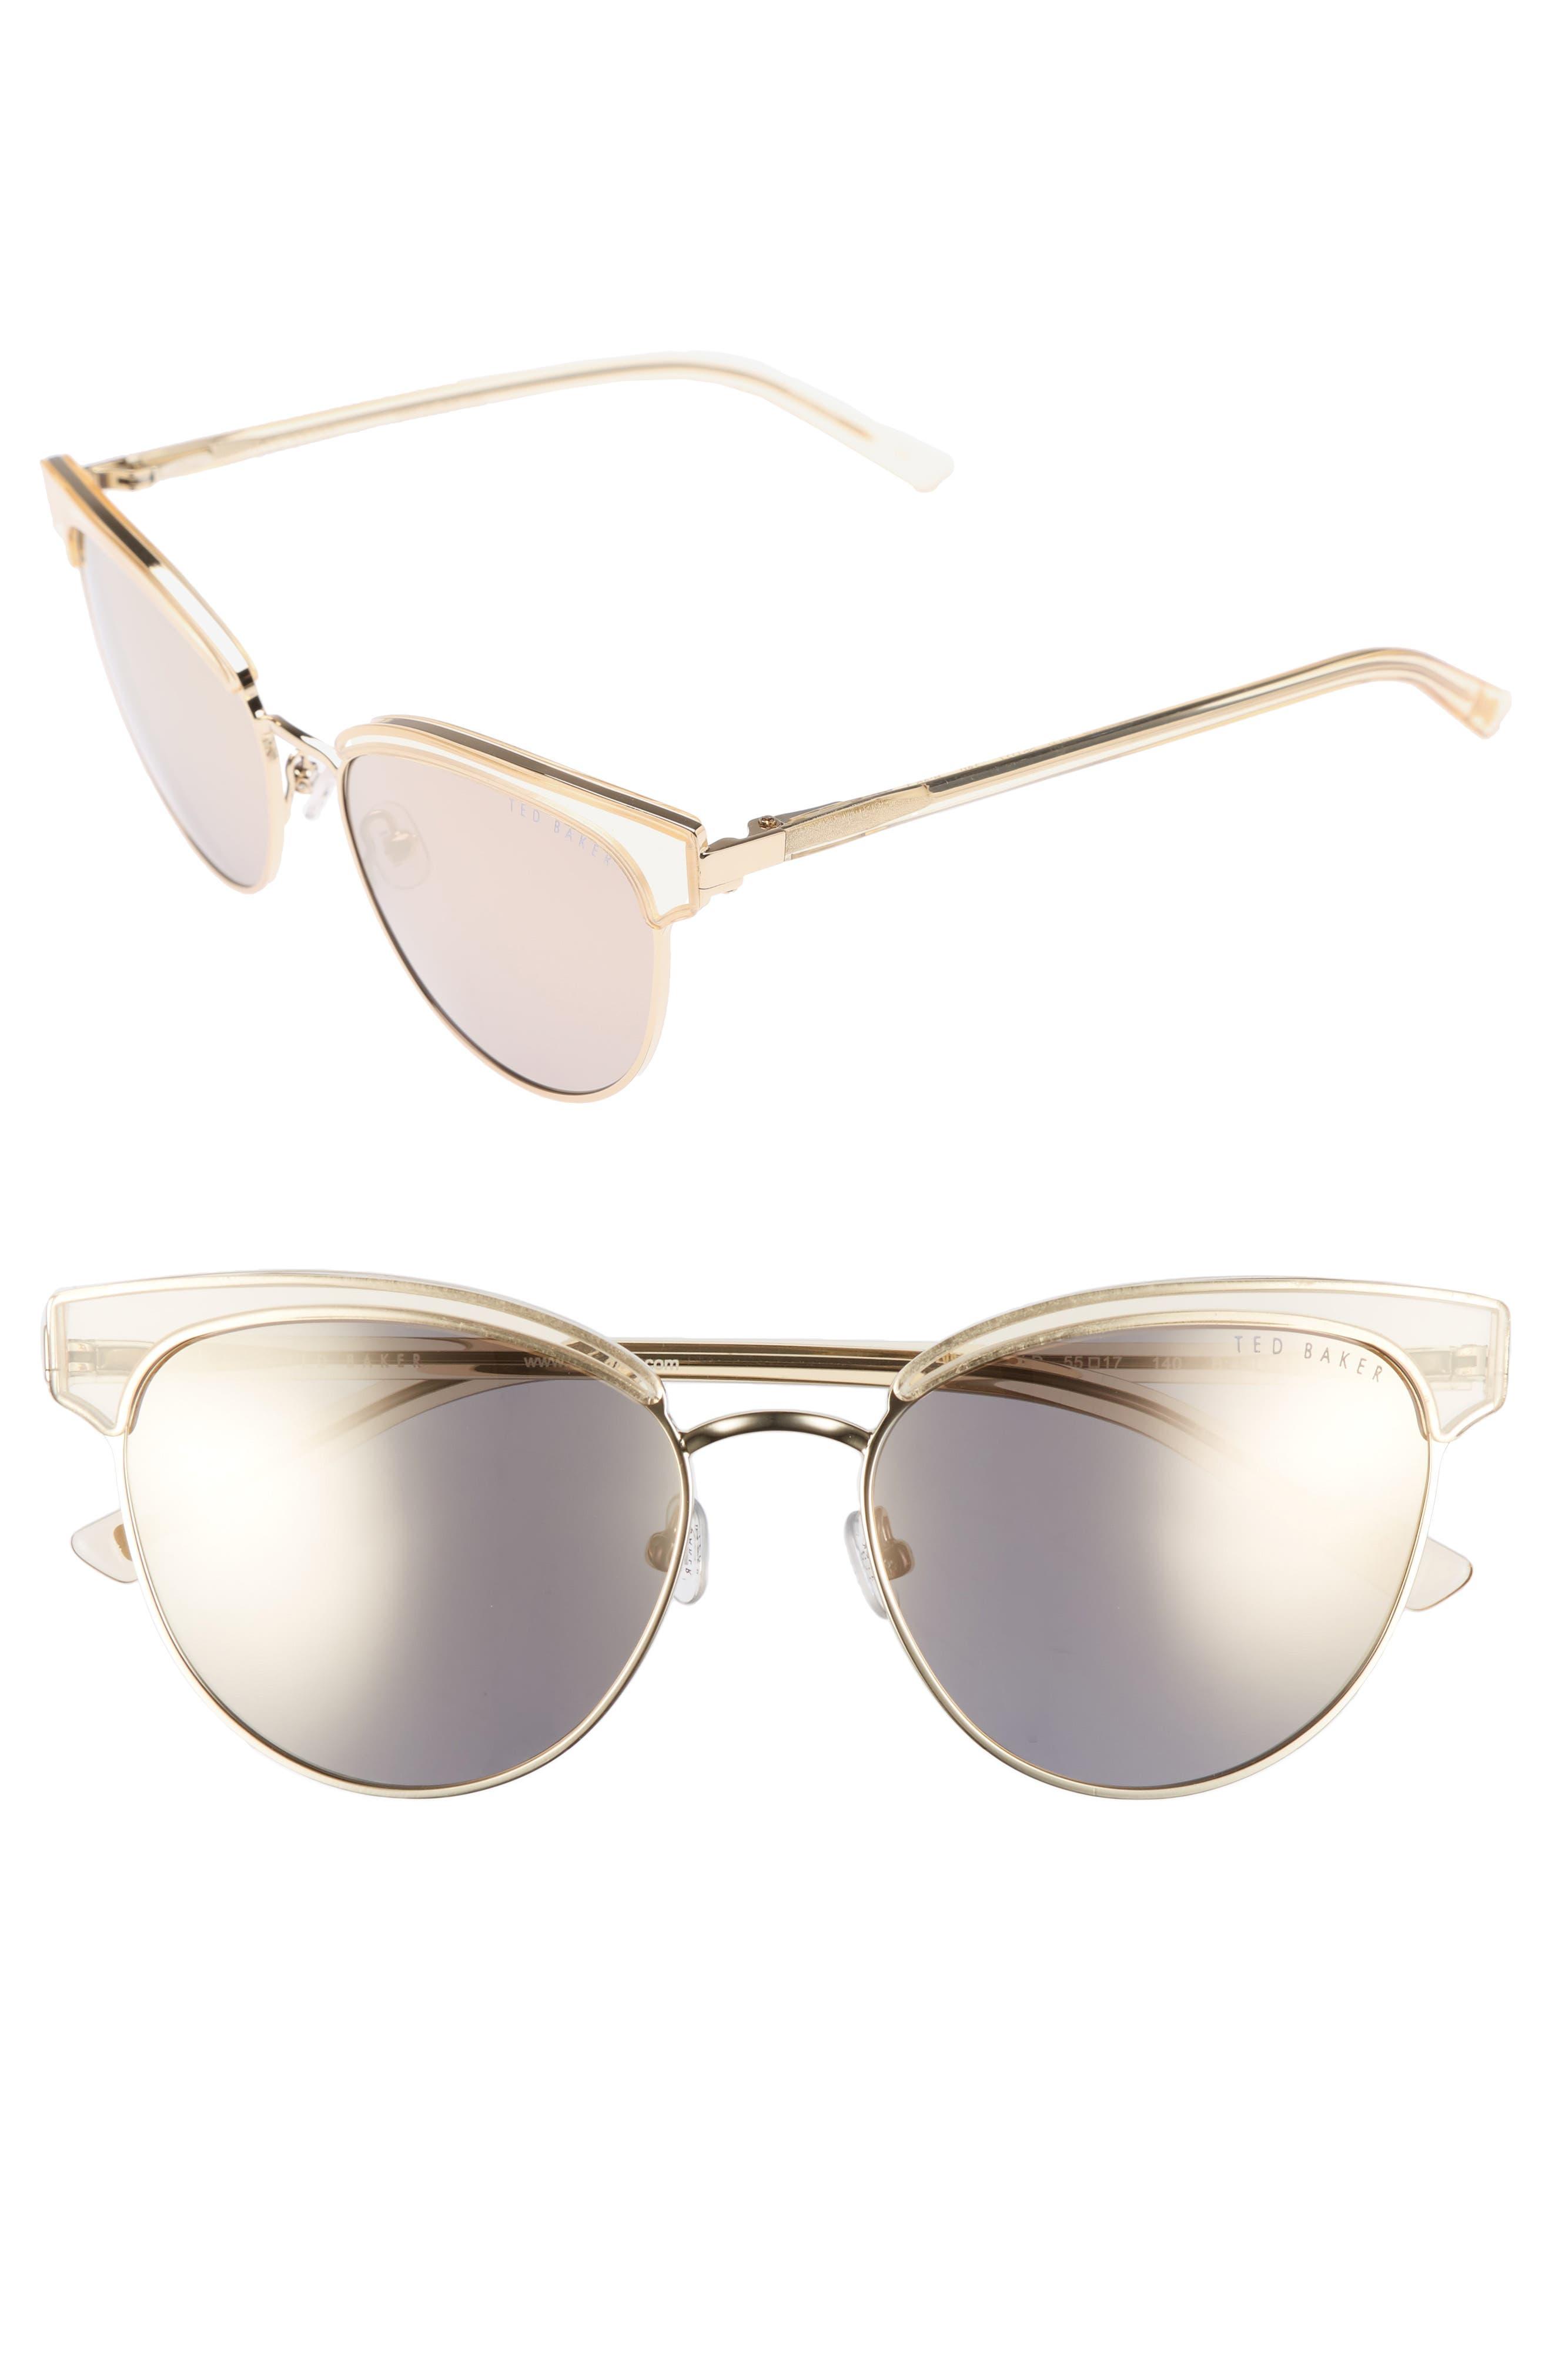 55mm Mirrored Semi Rimless Cat Eye Sunglasses,                         Main,                         color, 710